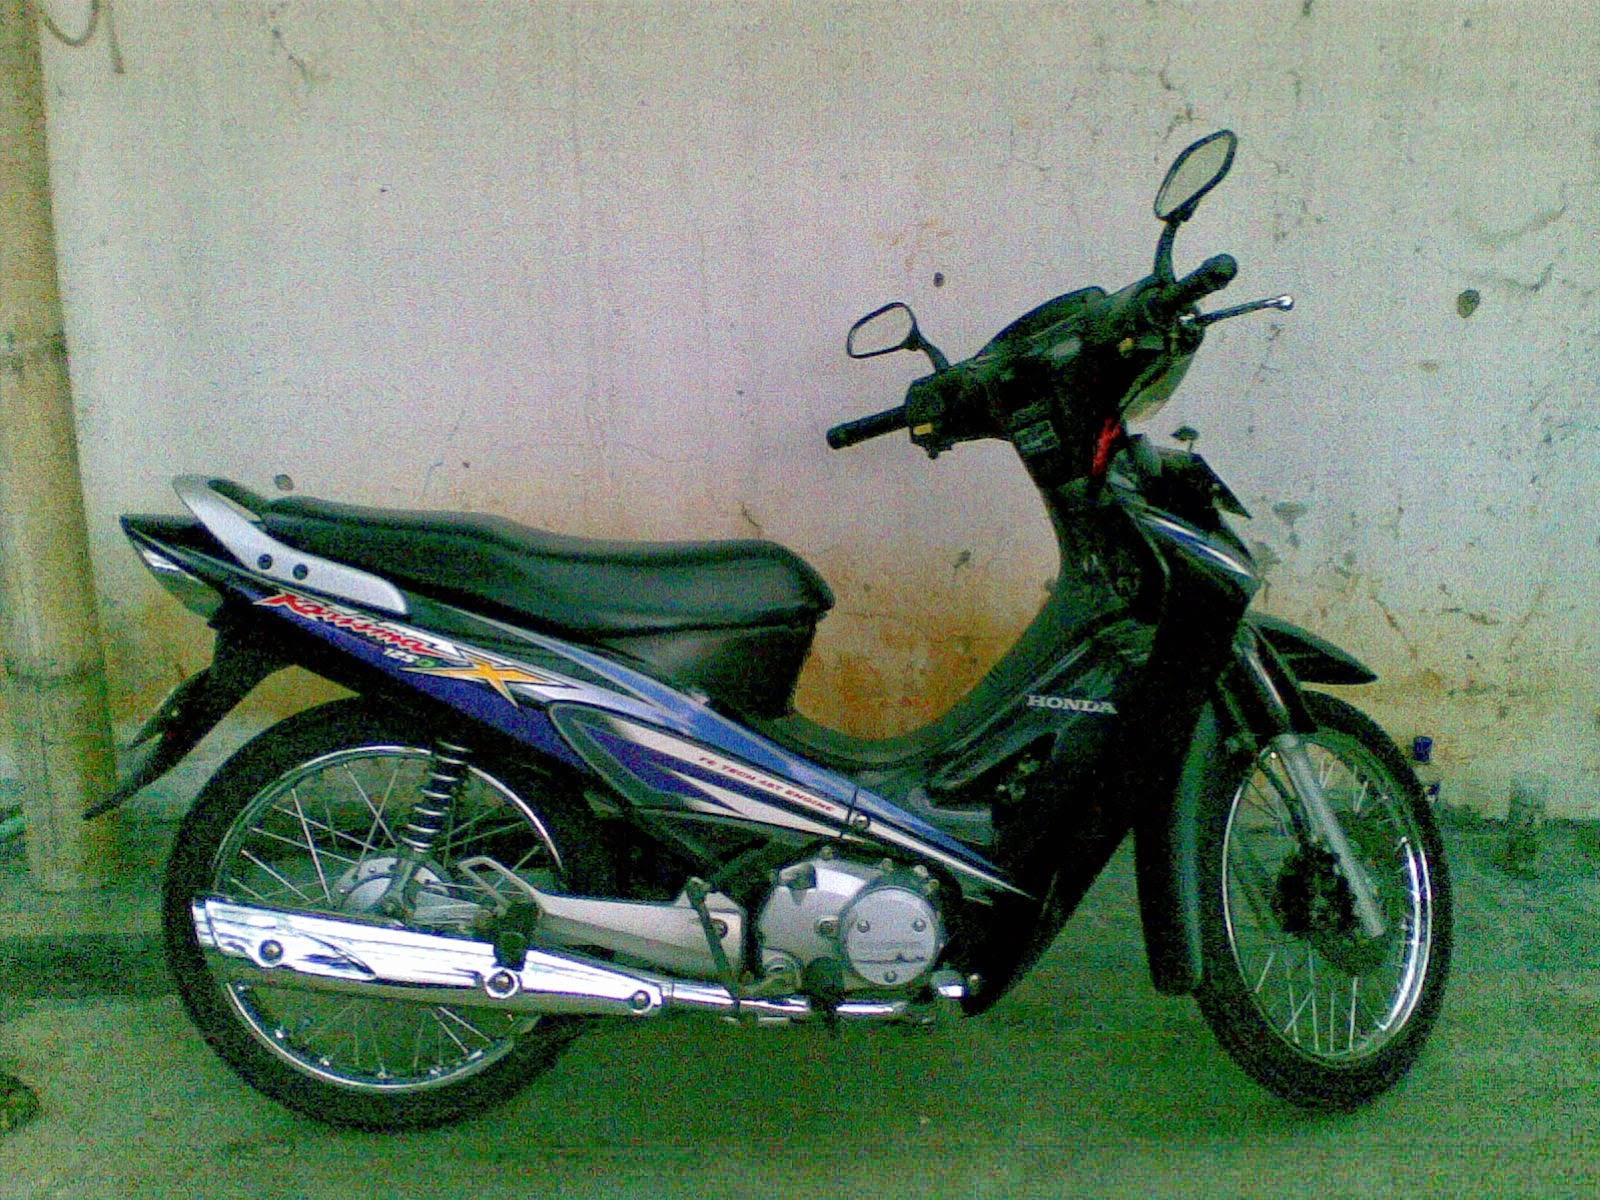 Modifikasi Motor Honda Karisma 125 X